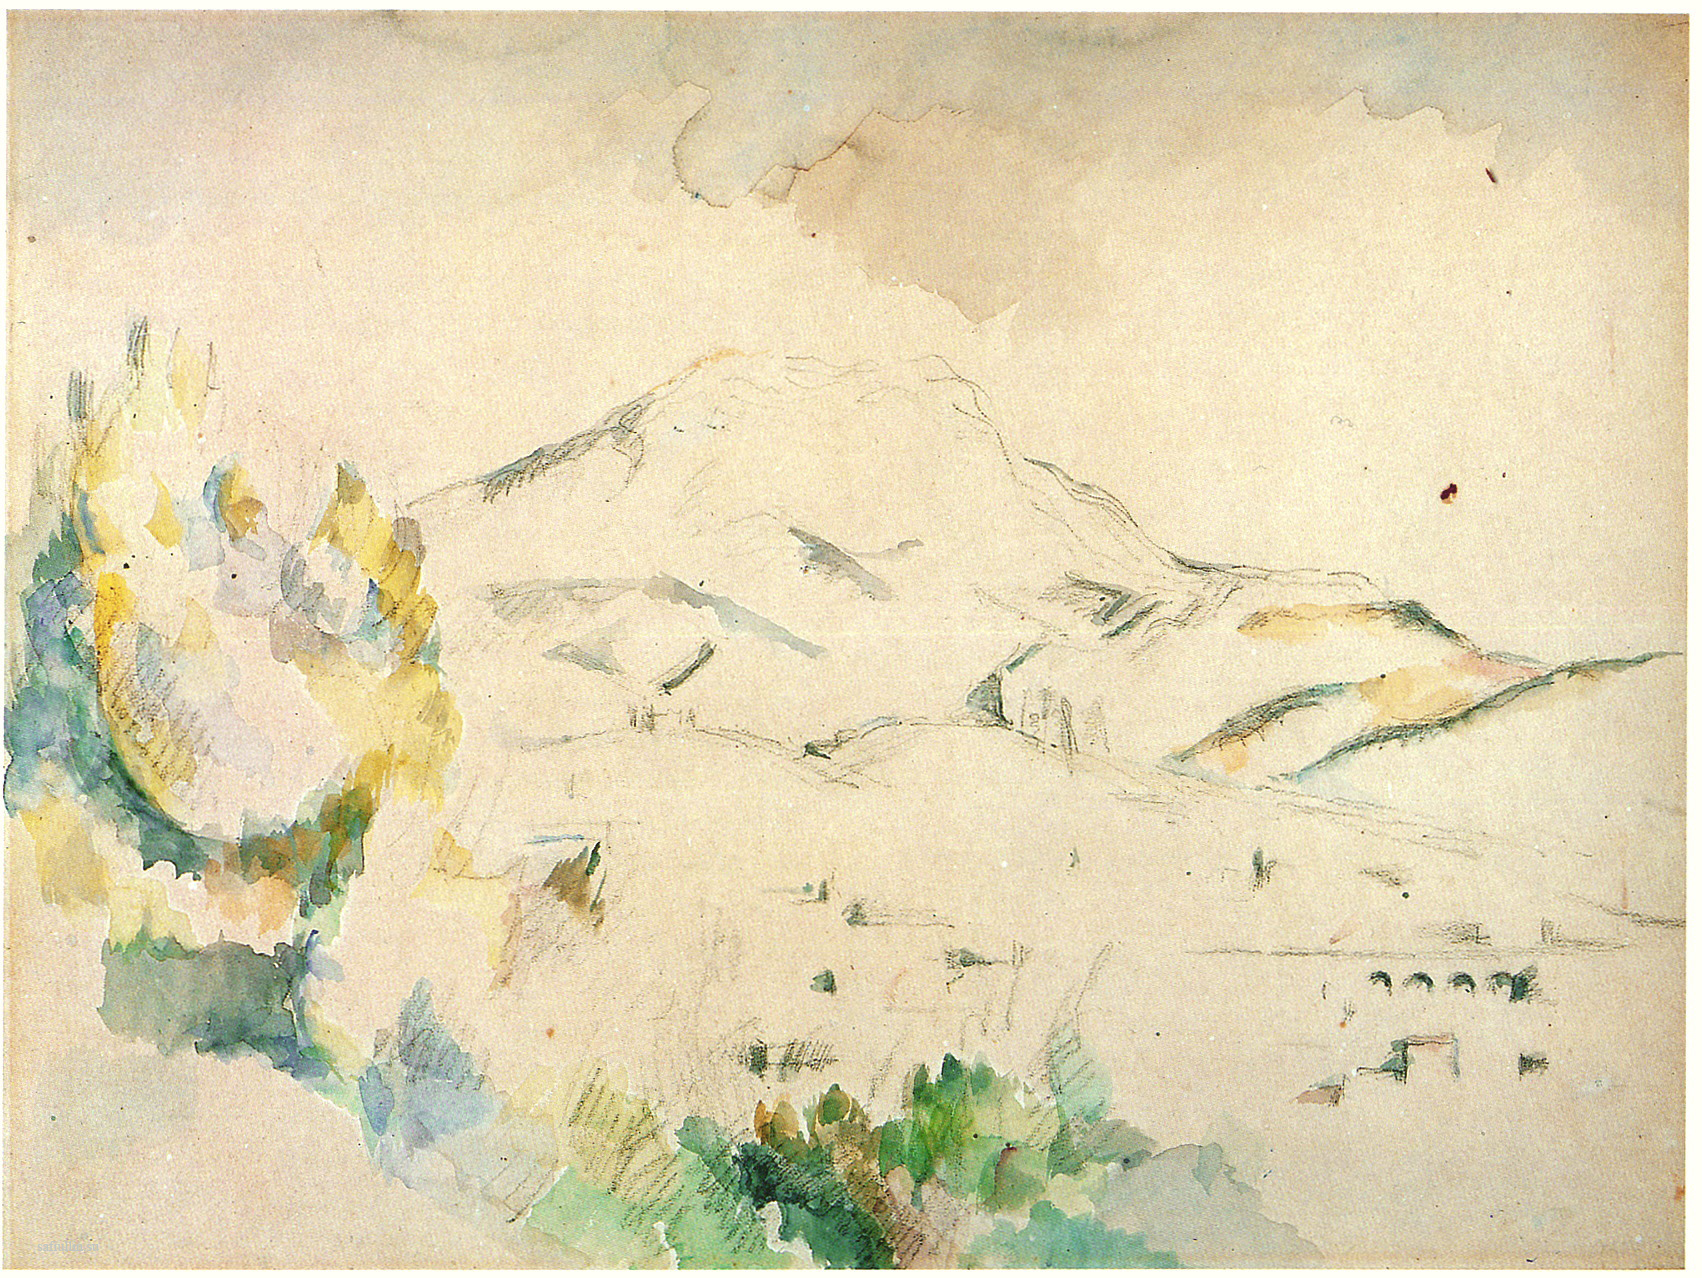 Сезанн рисунок La Montagne Sainte-Victoire пейзажи природы Сафиуллин Акварель 1885